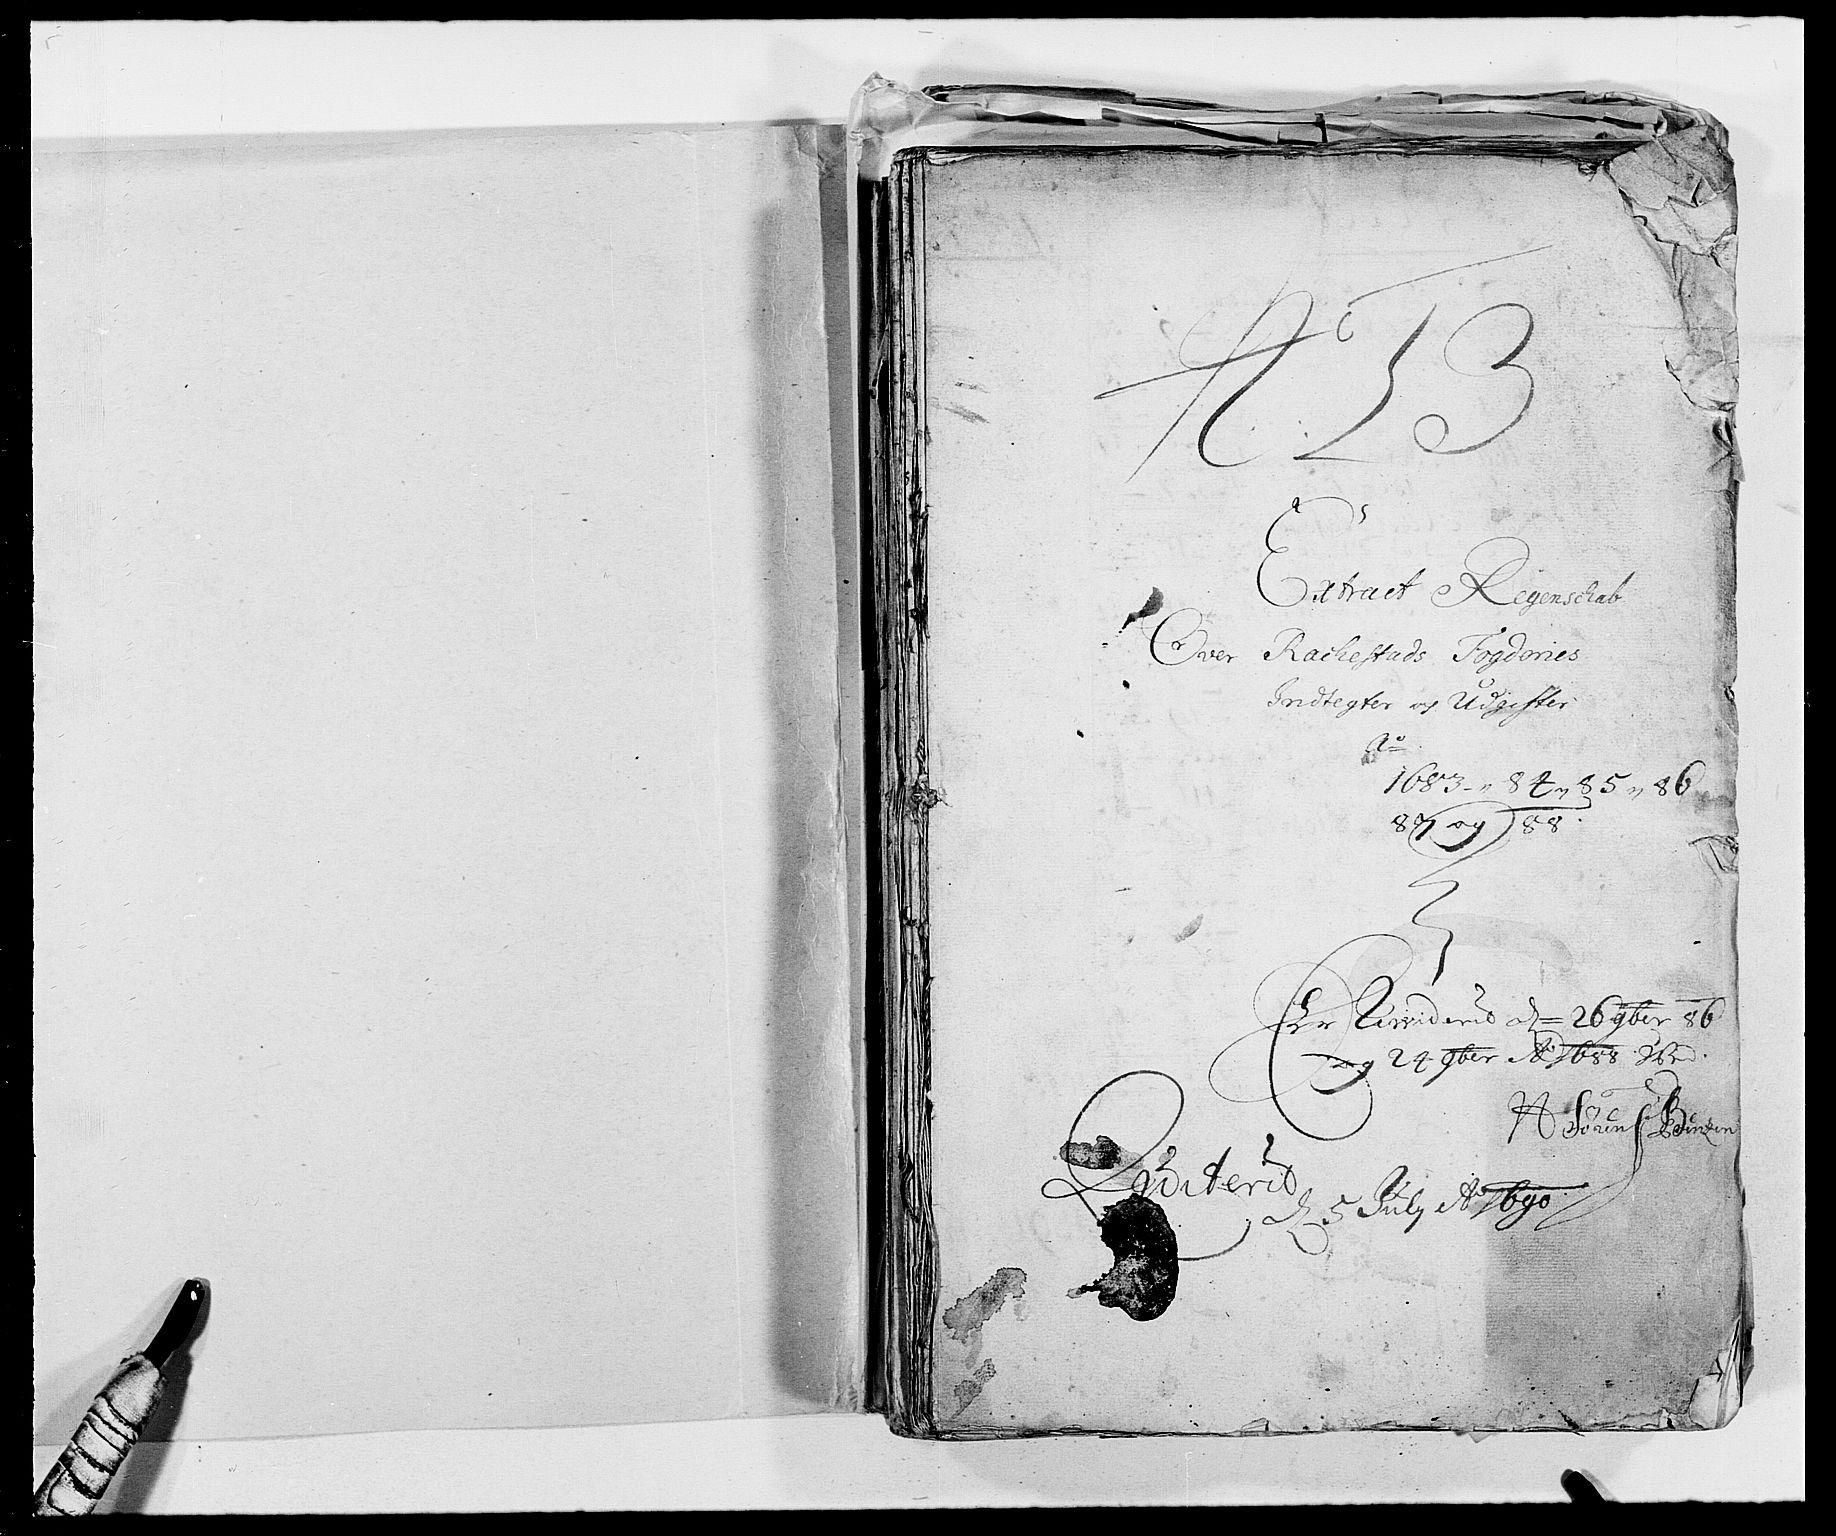 RA, Rentekammeret inntil 1814, Reviderte regnskaper, Fogderegnskap, R05/L0276: Fogderegnskap Rakkestad, 1683-1688, s. 248